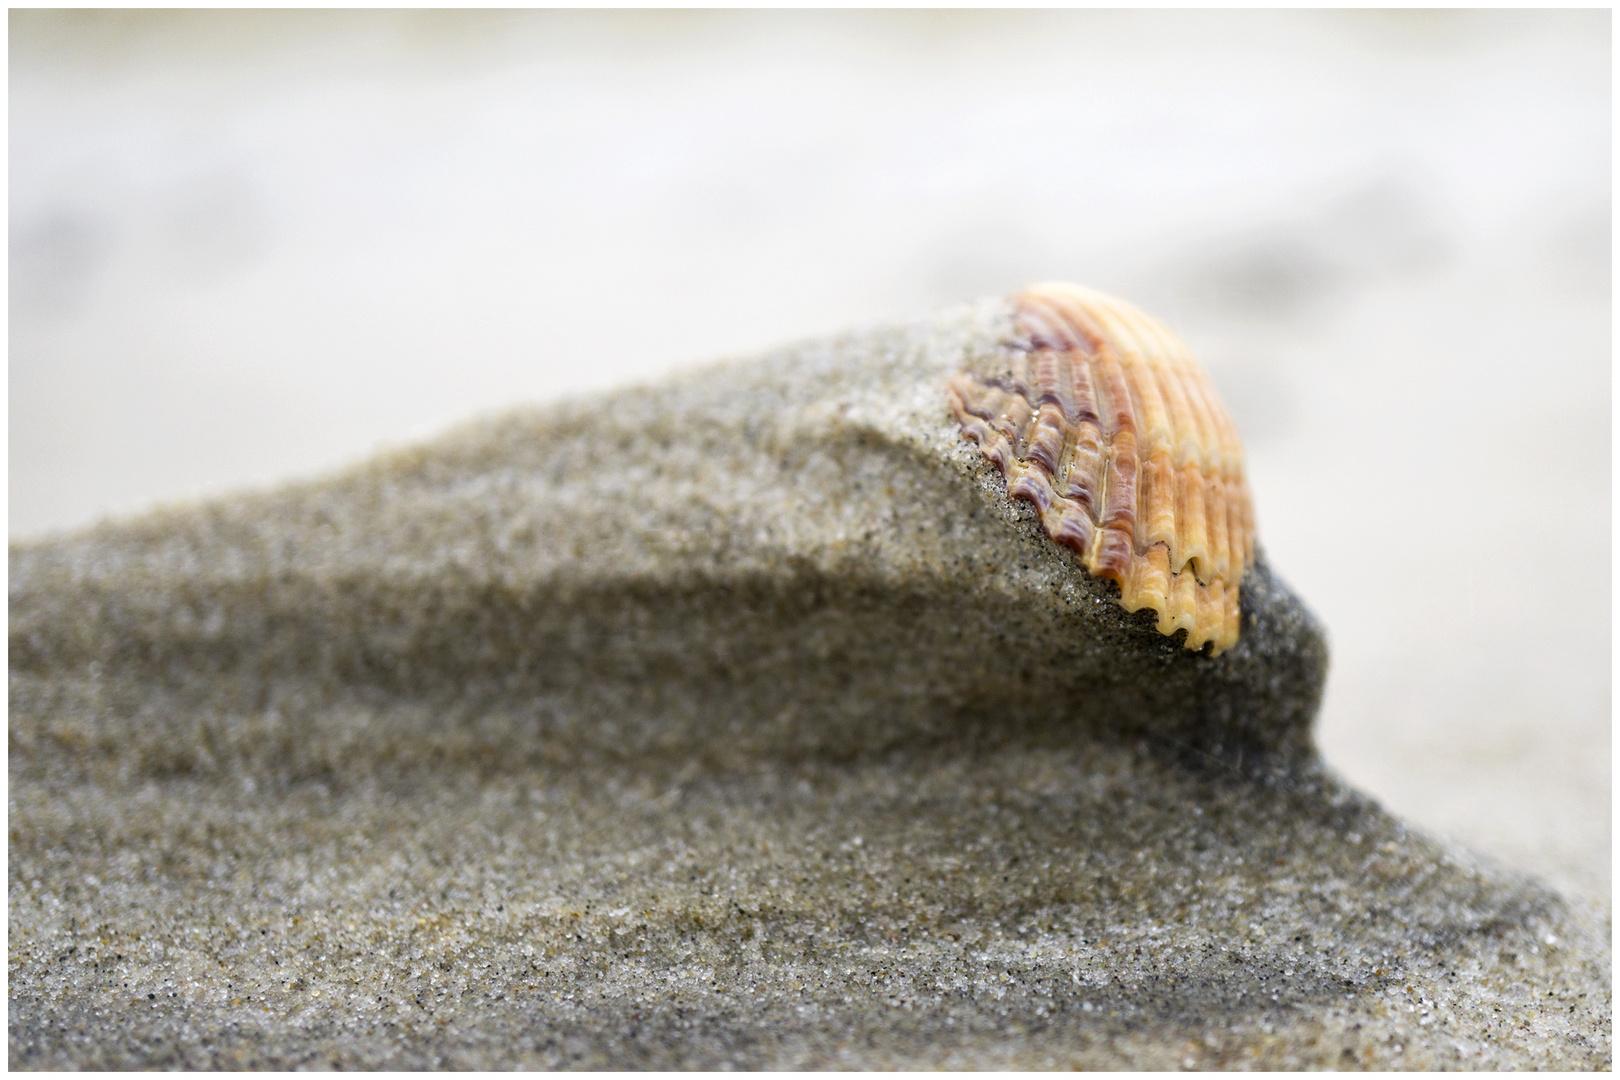 Herzmuschel klammert sich an Minidüne